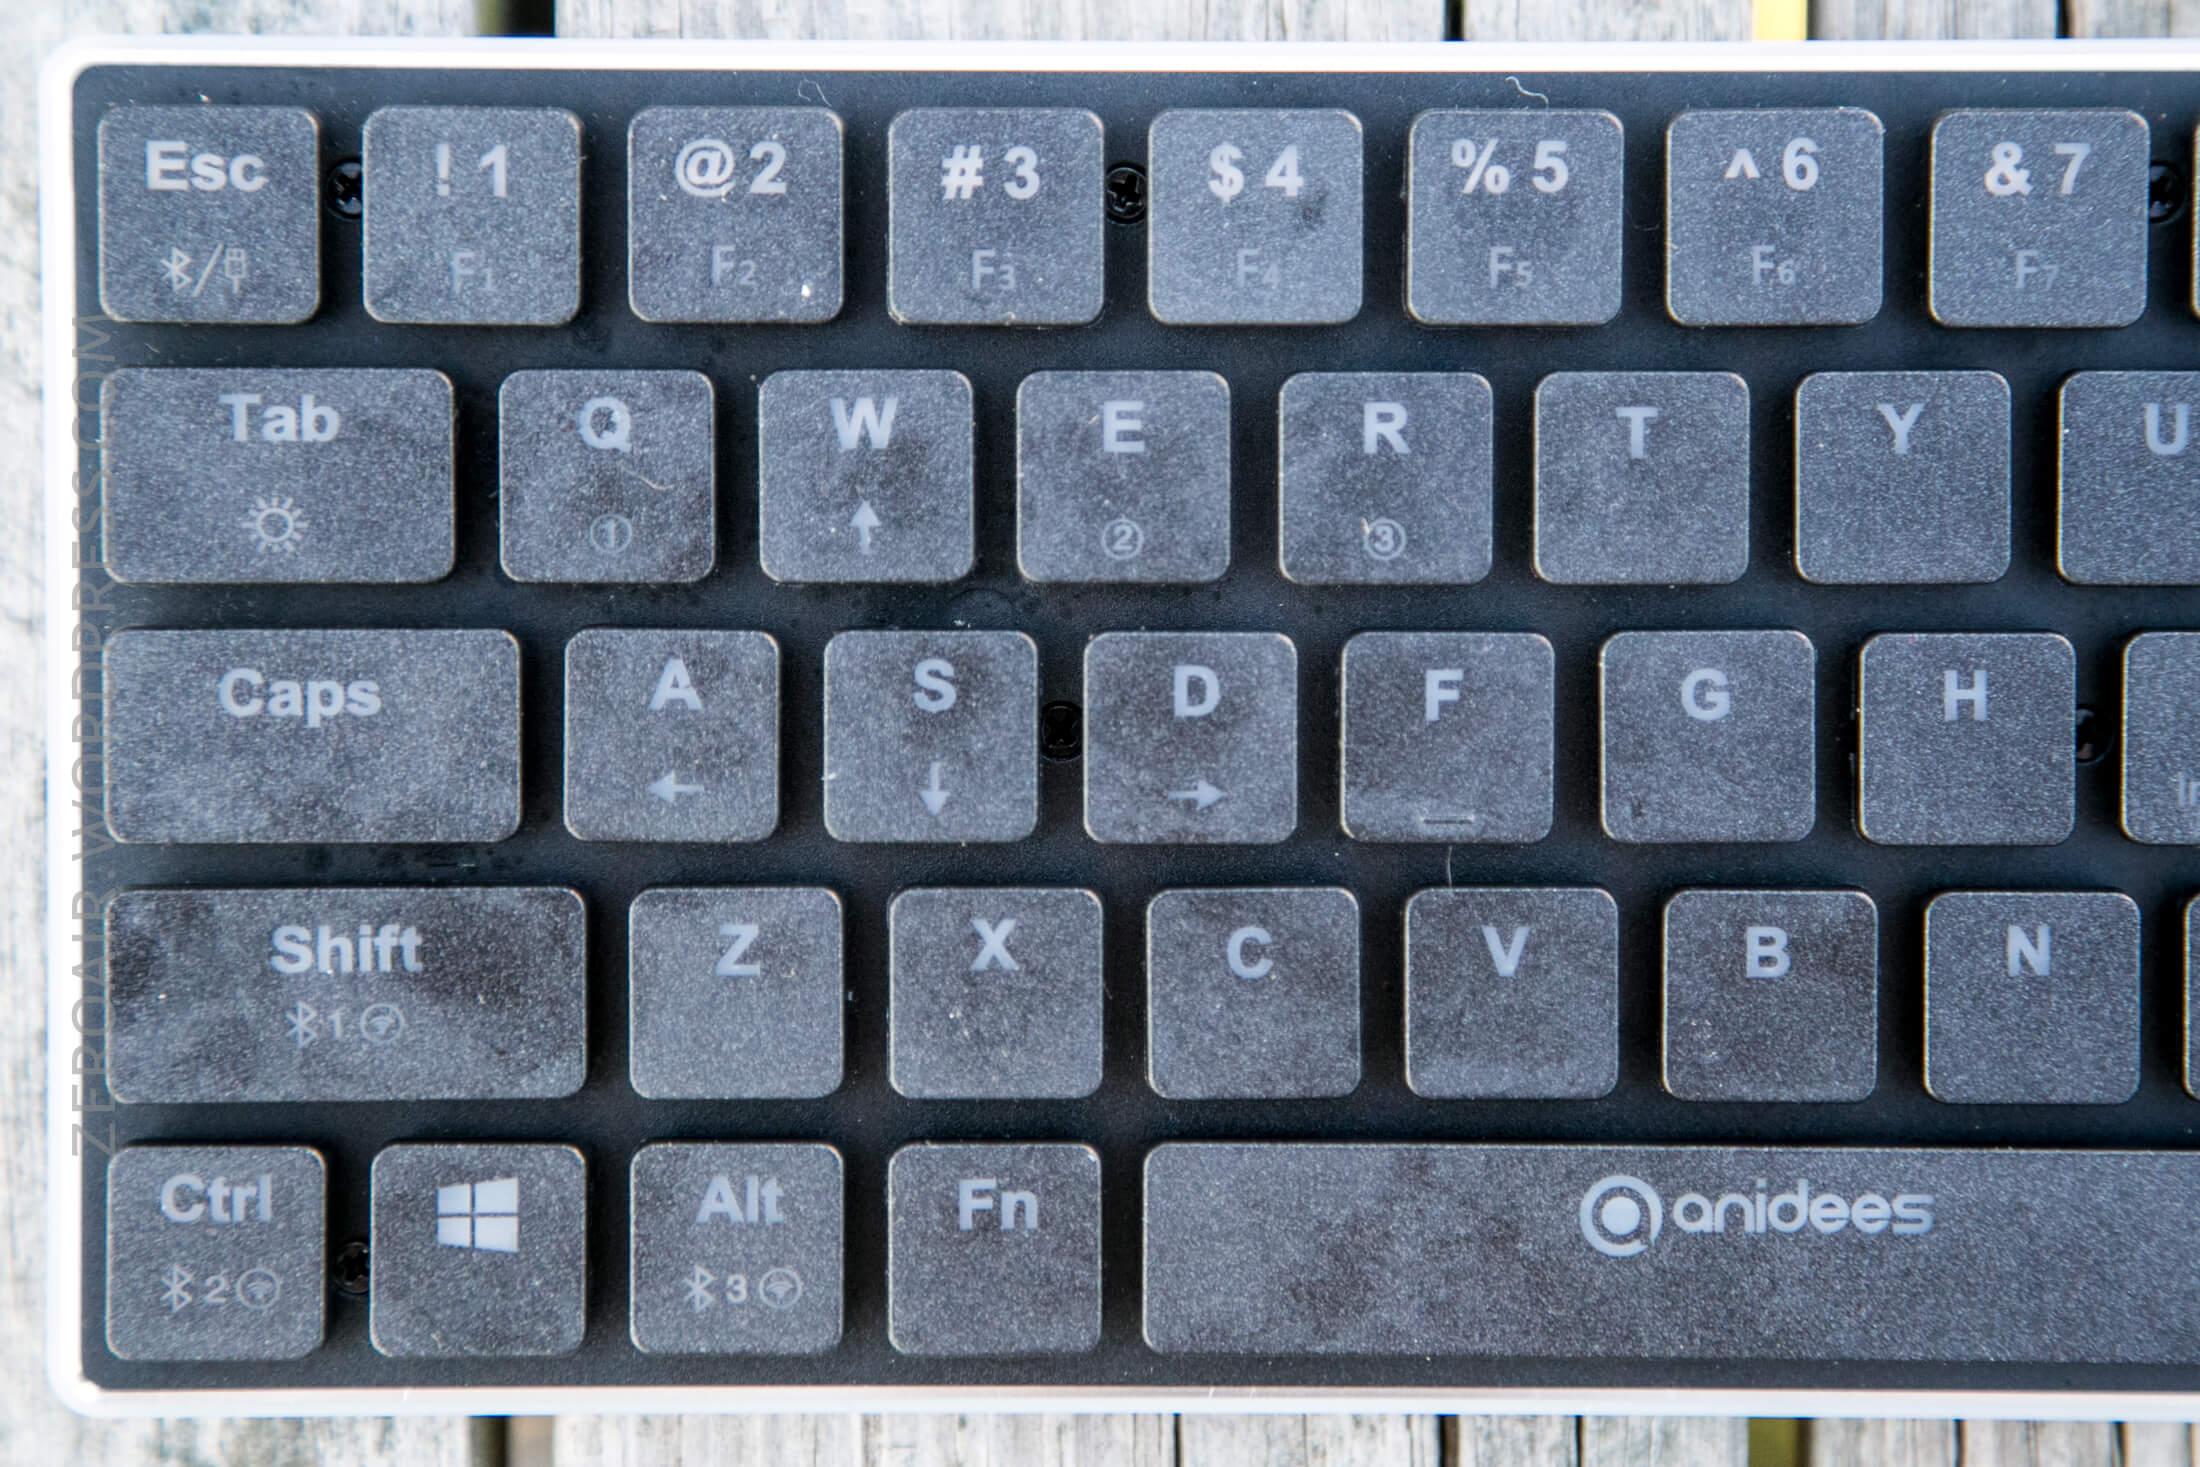 10_zeroair_reviews_anidees_prismatic_mechanical_keyboard.jpg